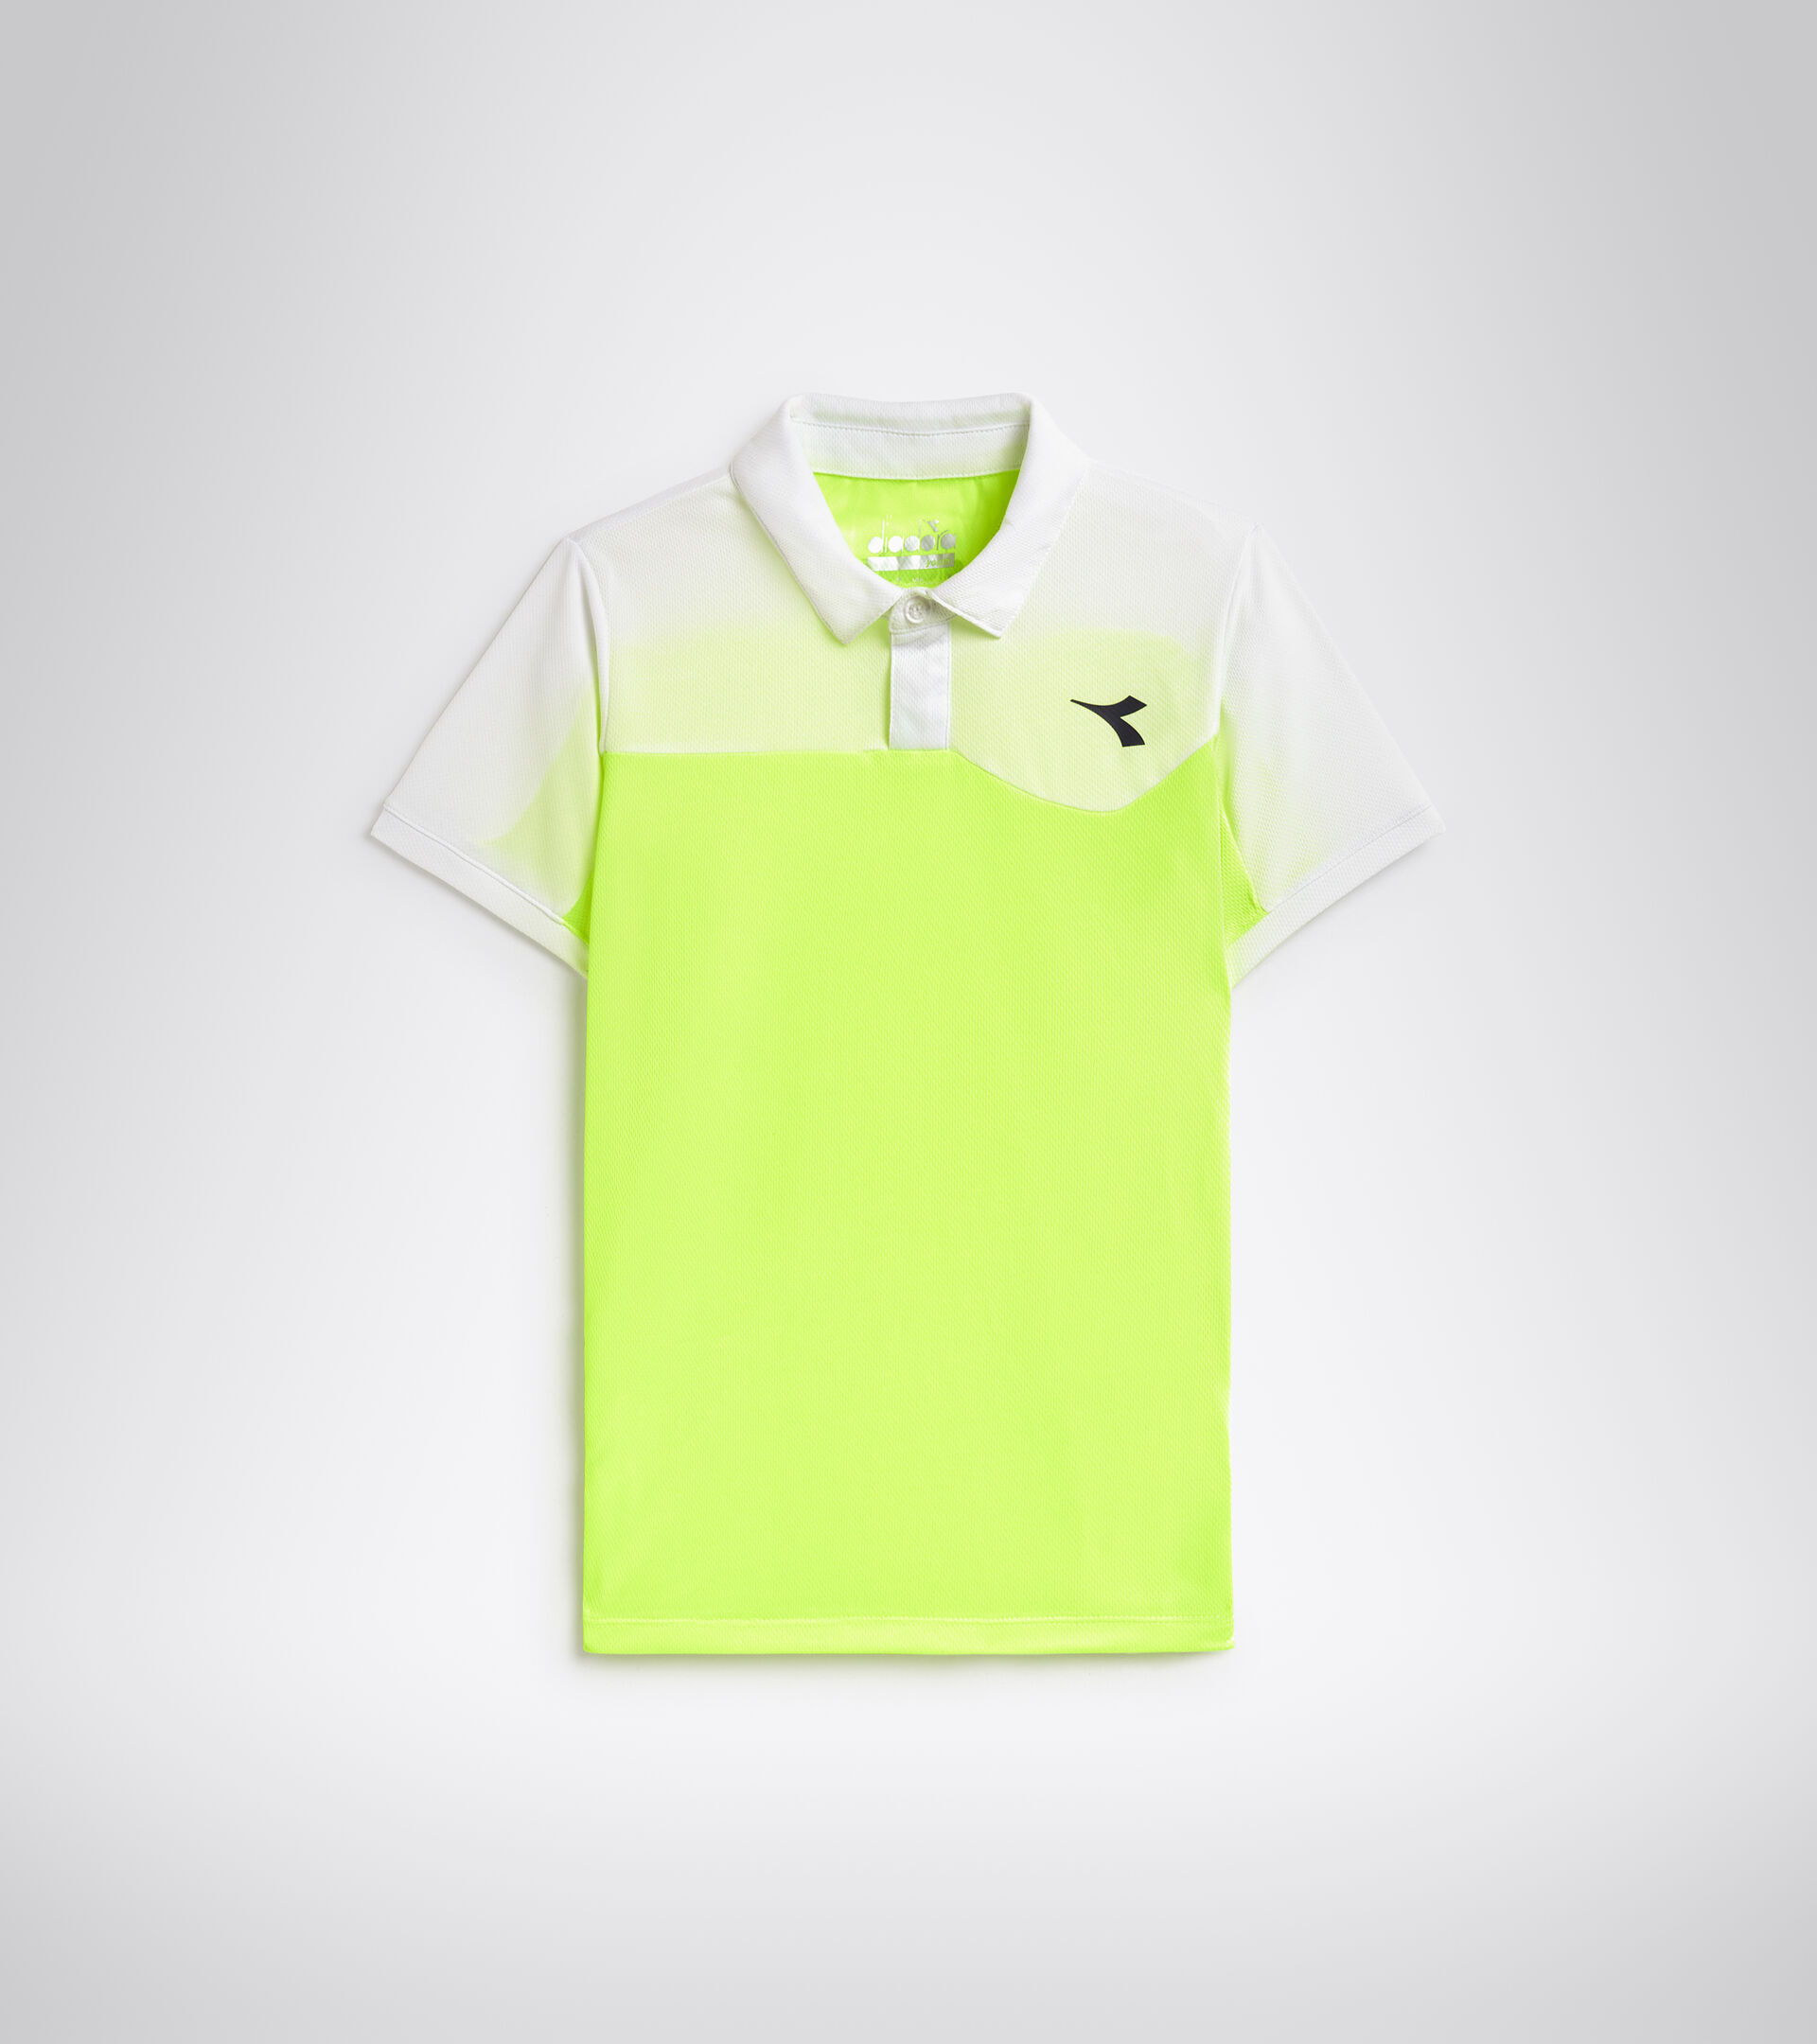 Tennis-Polohemd - Junior J. POLO COURT FLUO GELB DD - Diadora